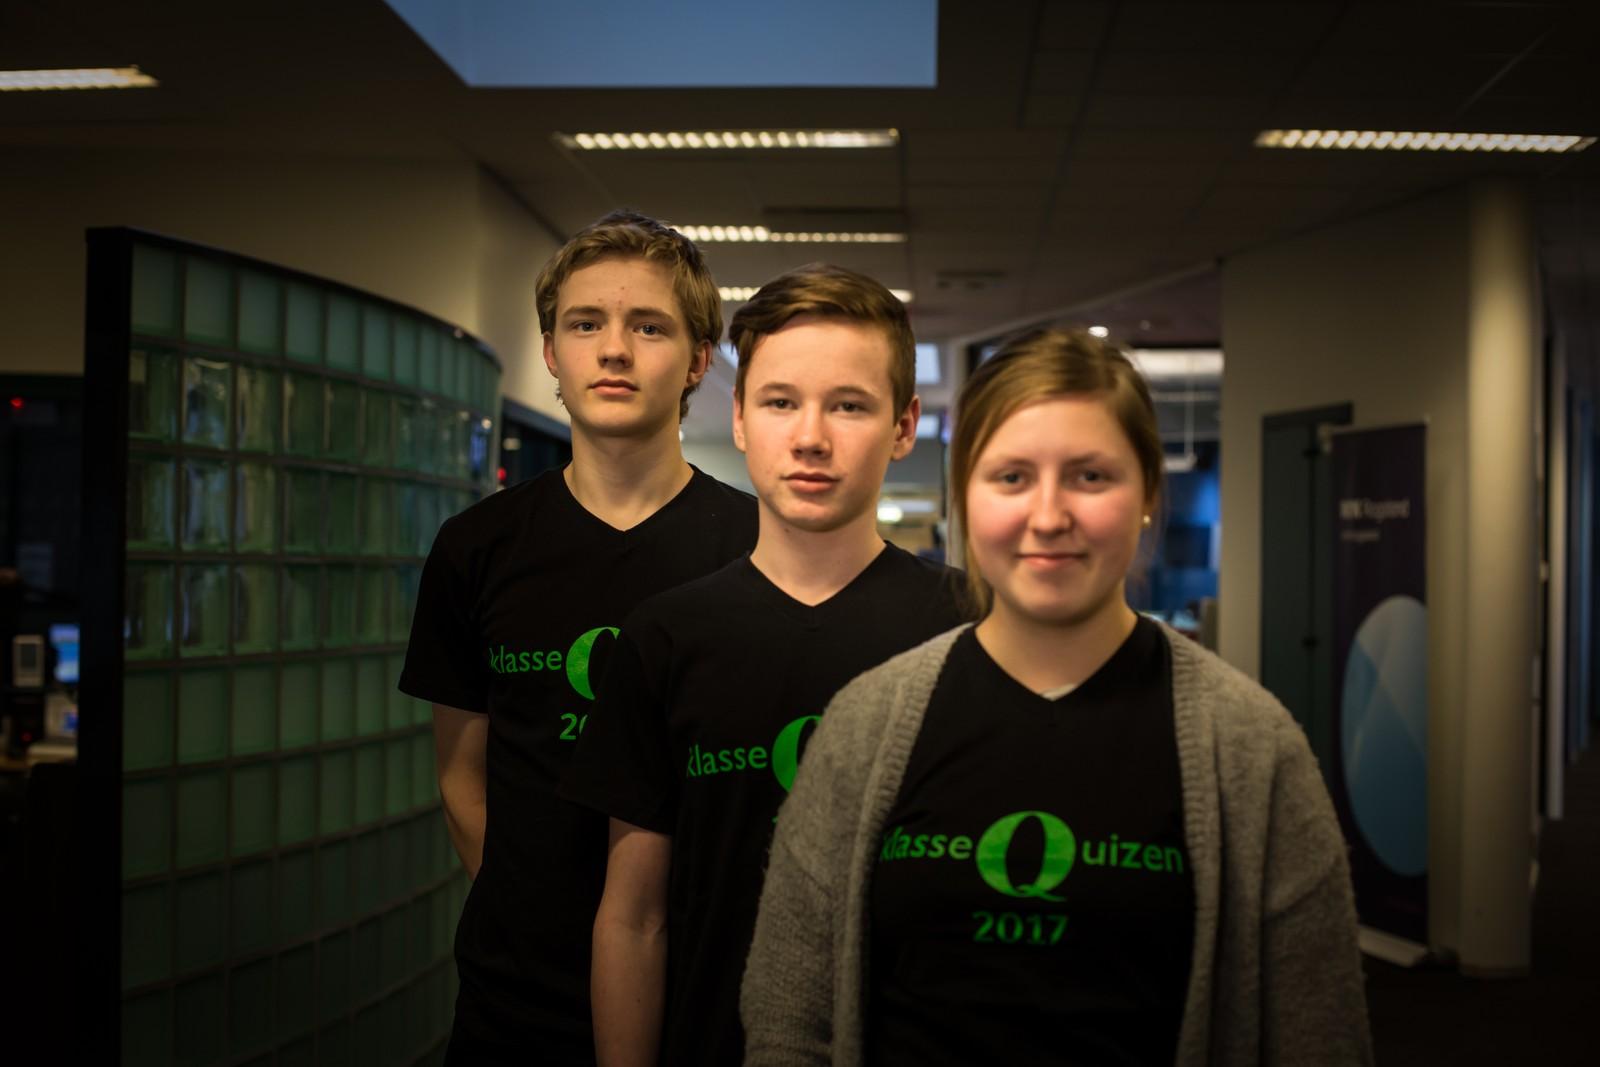 Varhaug ungdomskole fikk seks poeng i Klassequizen. Fra venstre: Ole Varhaug, Magnus Berge Galtvik og Birgitte Lende.